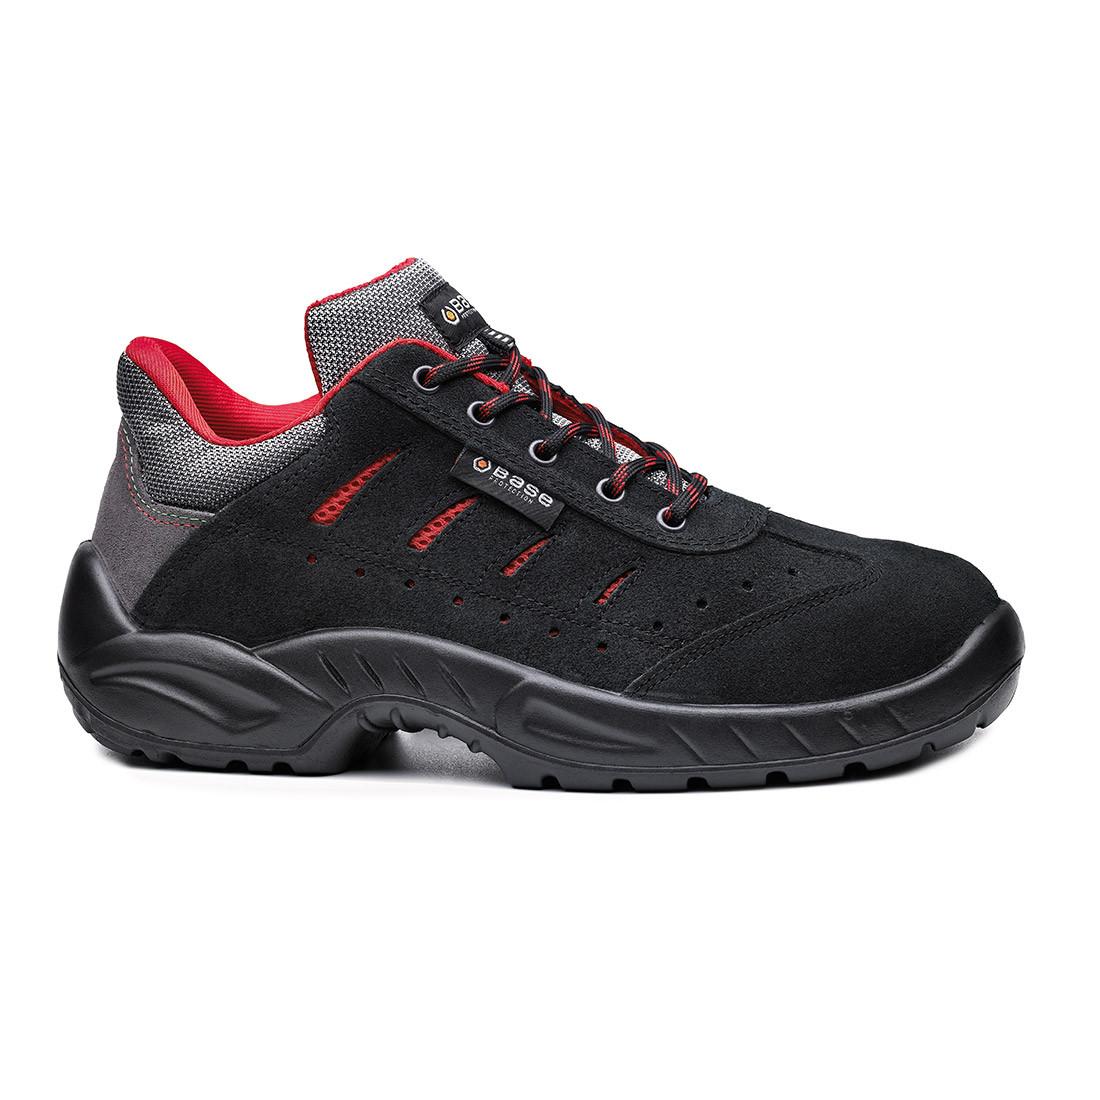 Pantofi Toledo S1P SRC - Incaltaminte de protectie